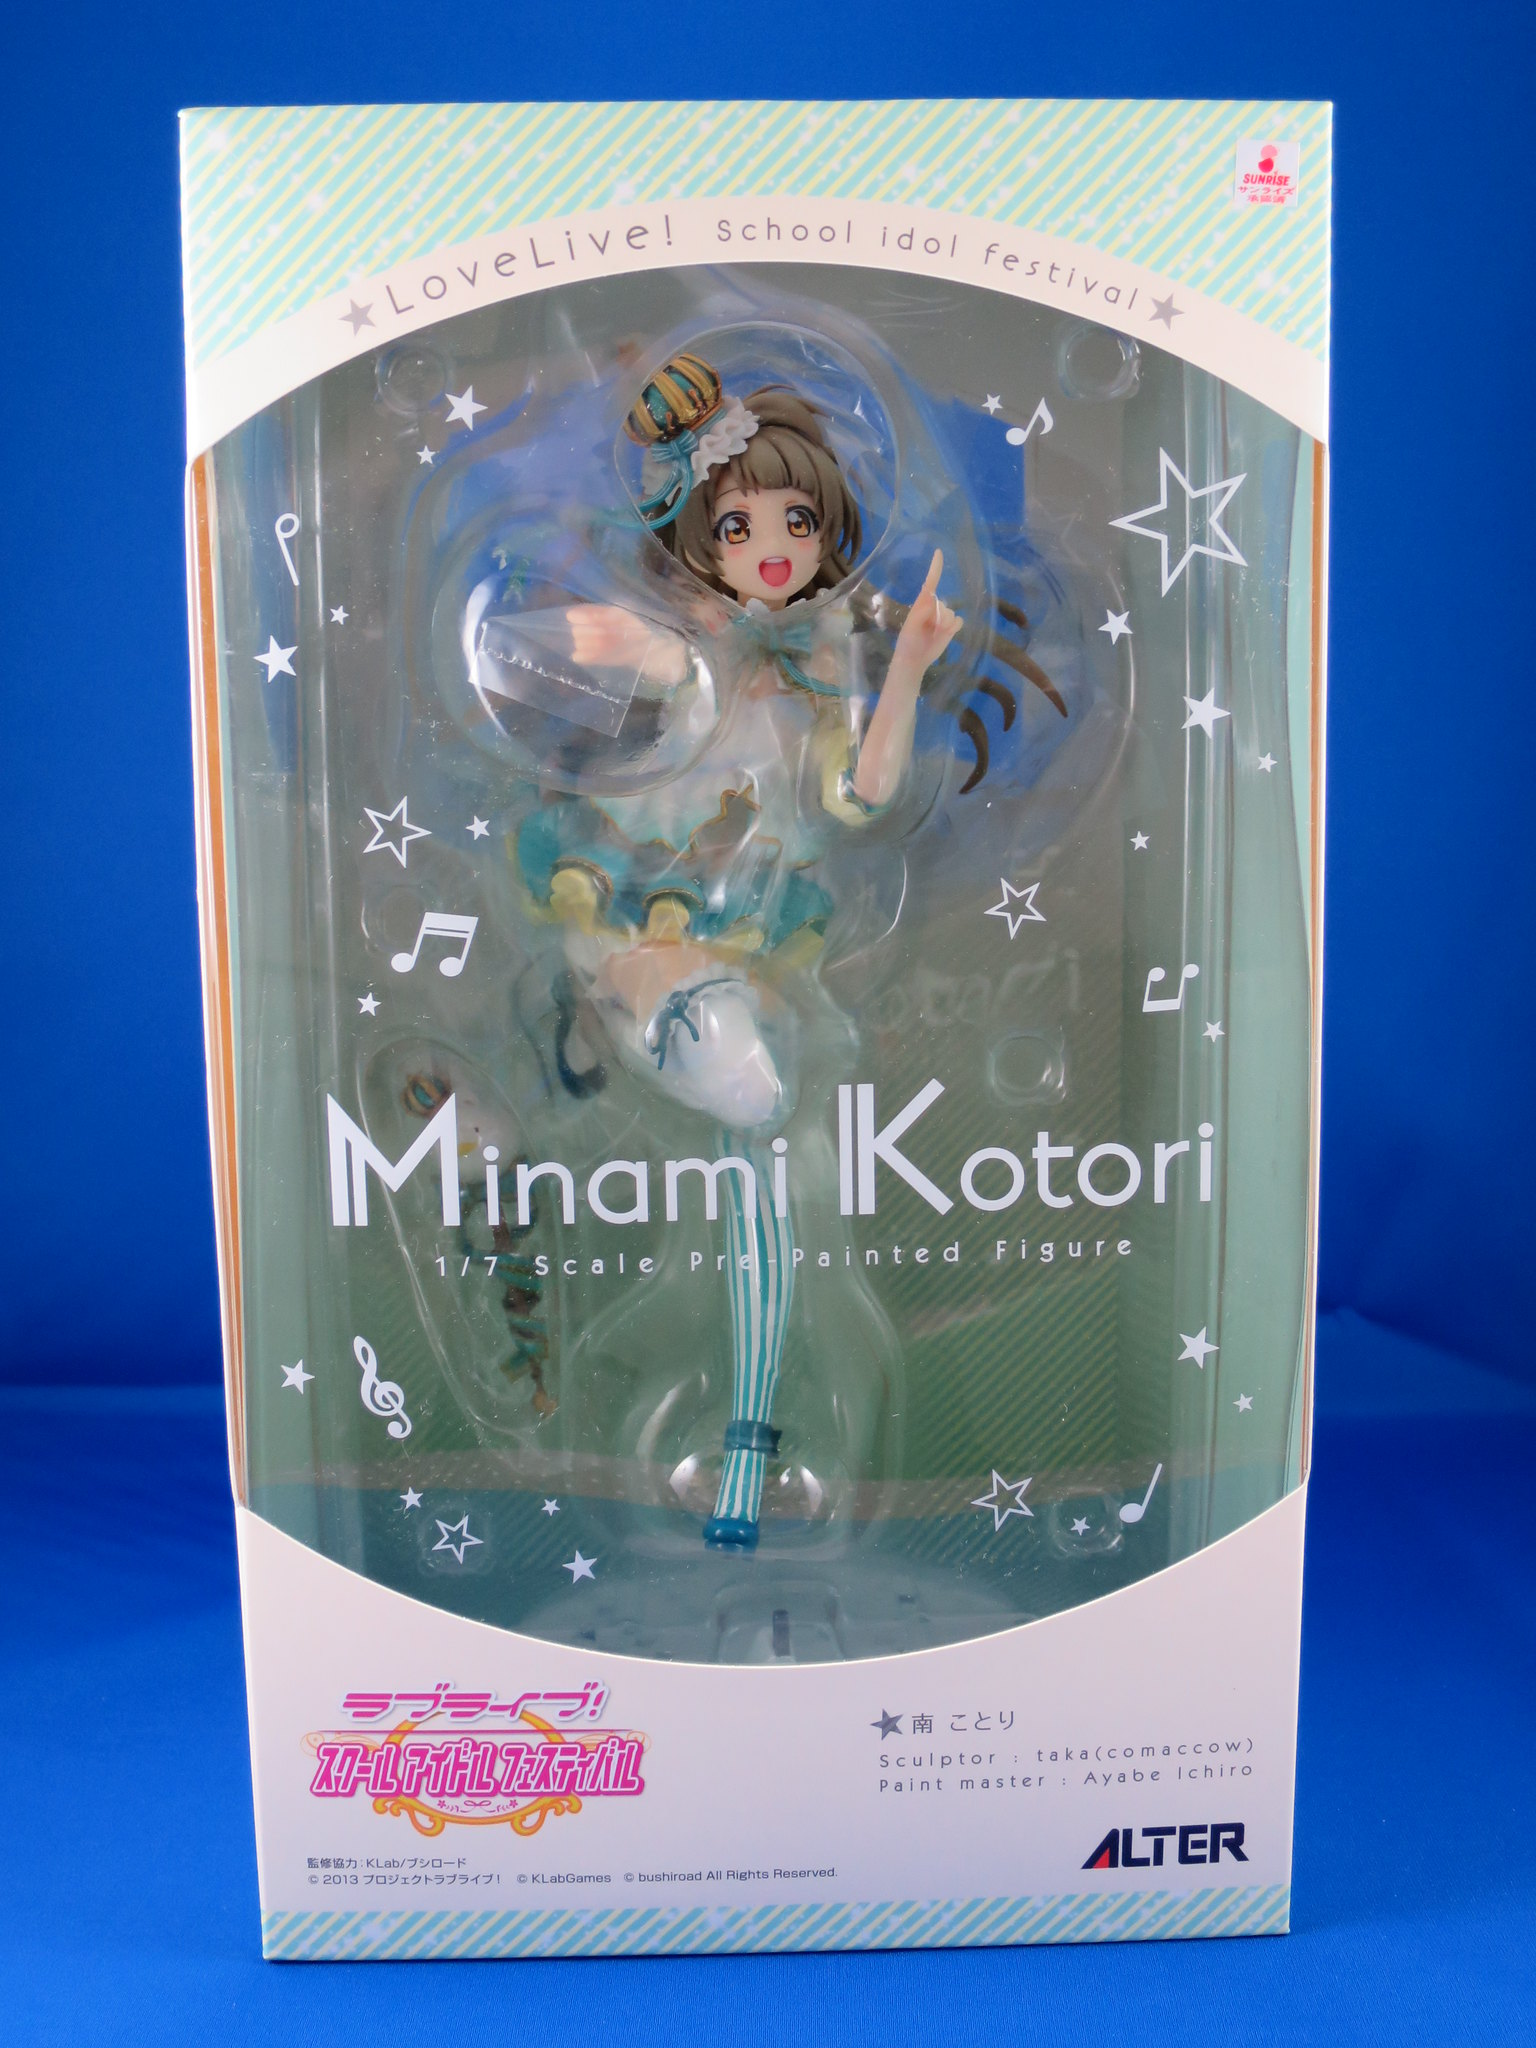 BM: Minami Kotori